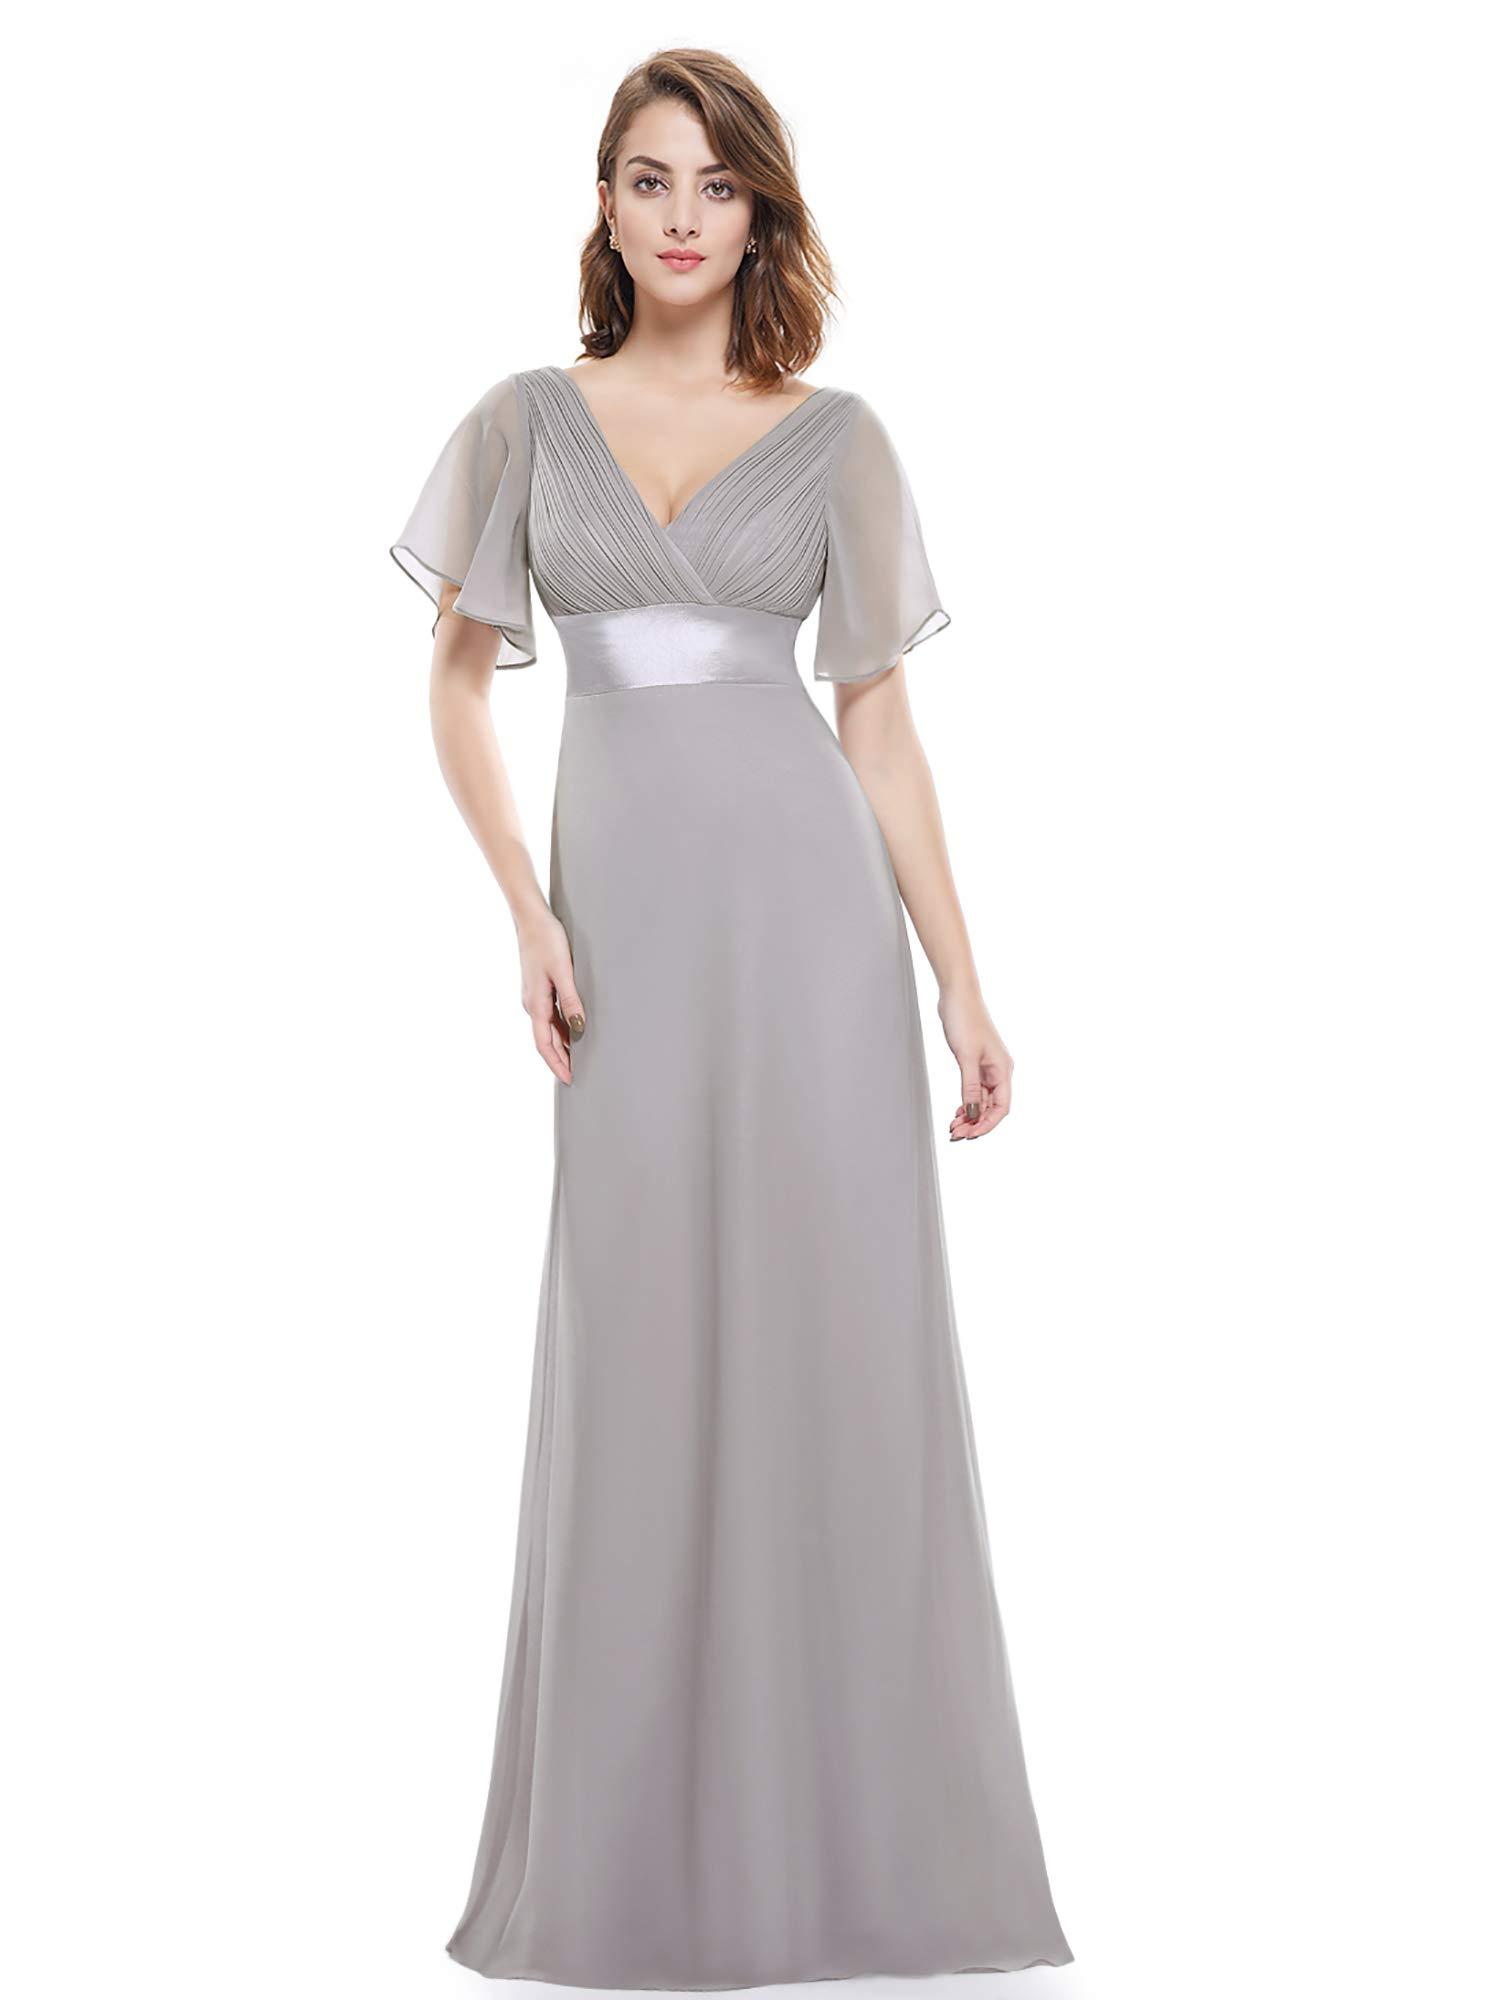 144aea174a Ever-Pretty Womens Floor Length Formal Wedding Guest Dress 16 US Grey